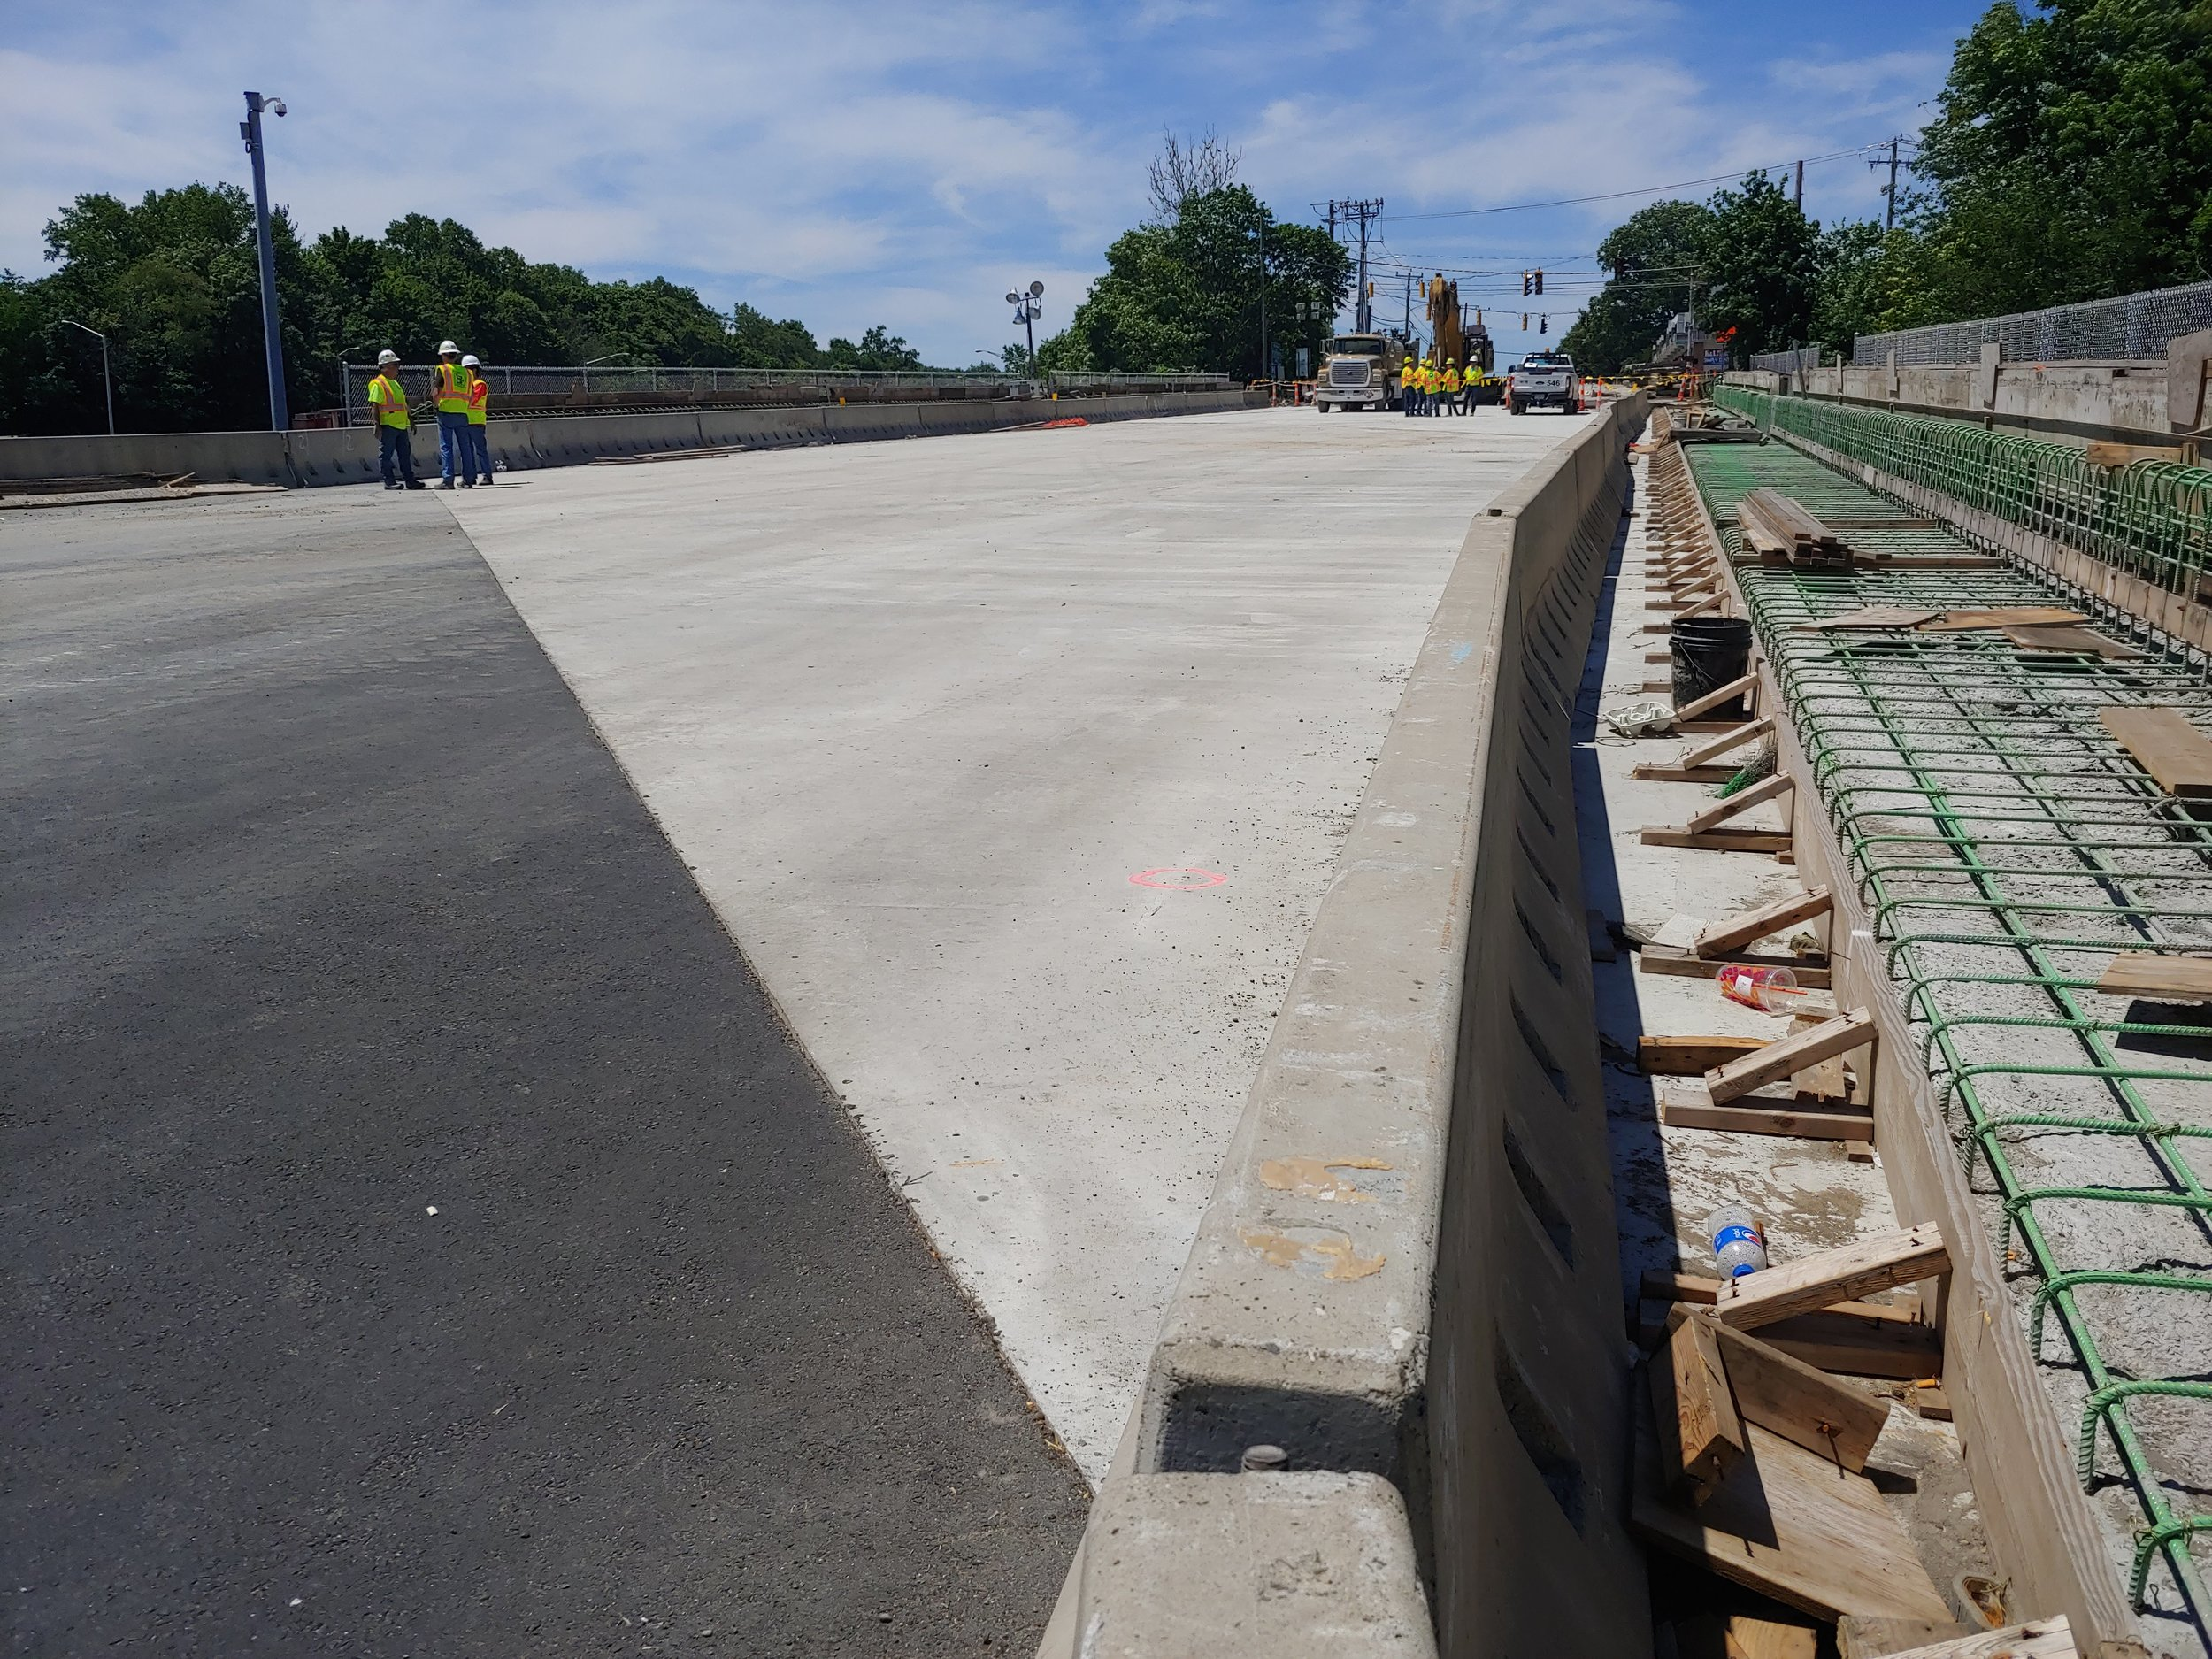 Both new bridge decks in place.  Taken on the morning of 6/9/19 by Kelsey Kahn